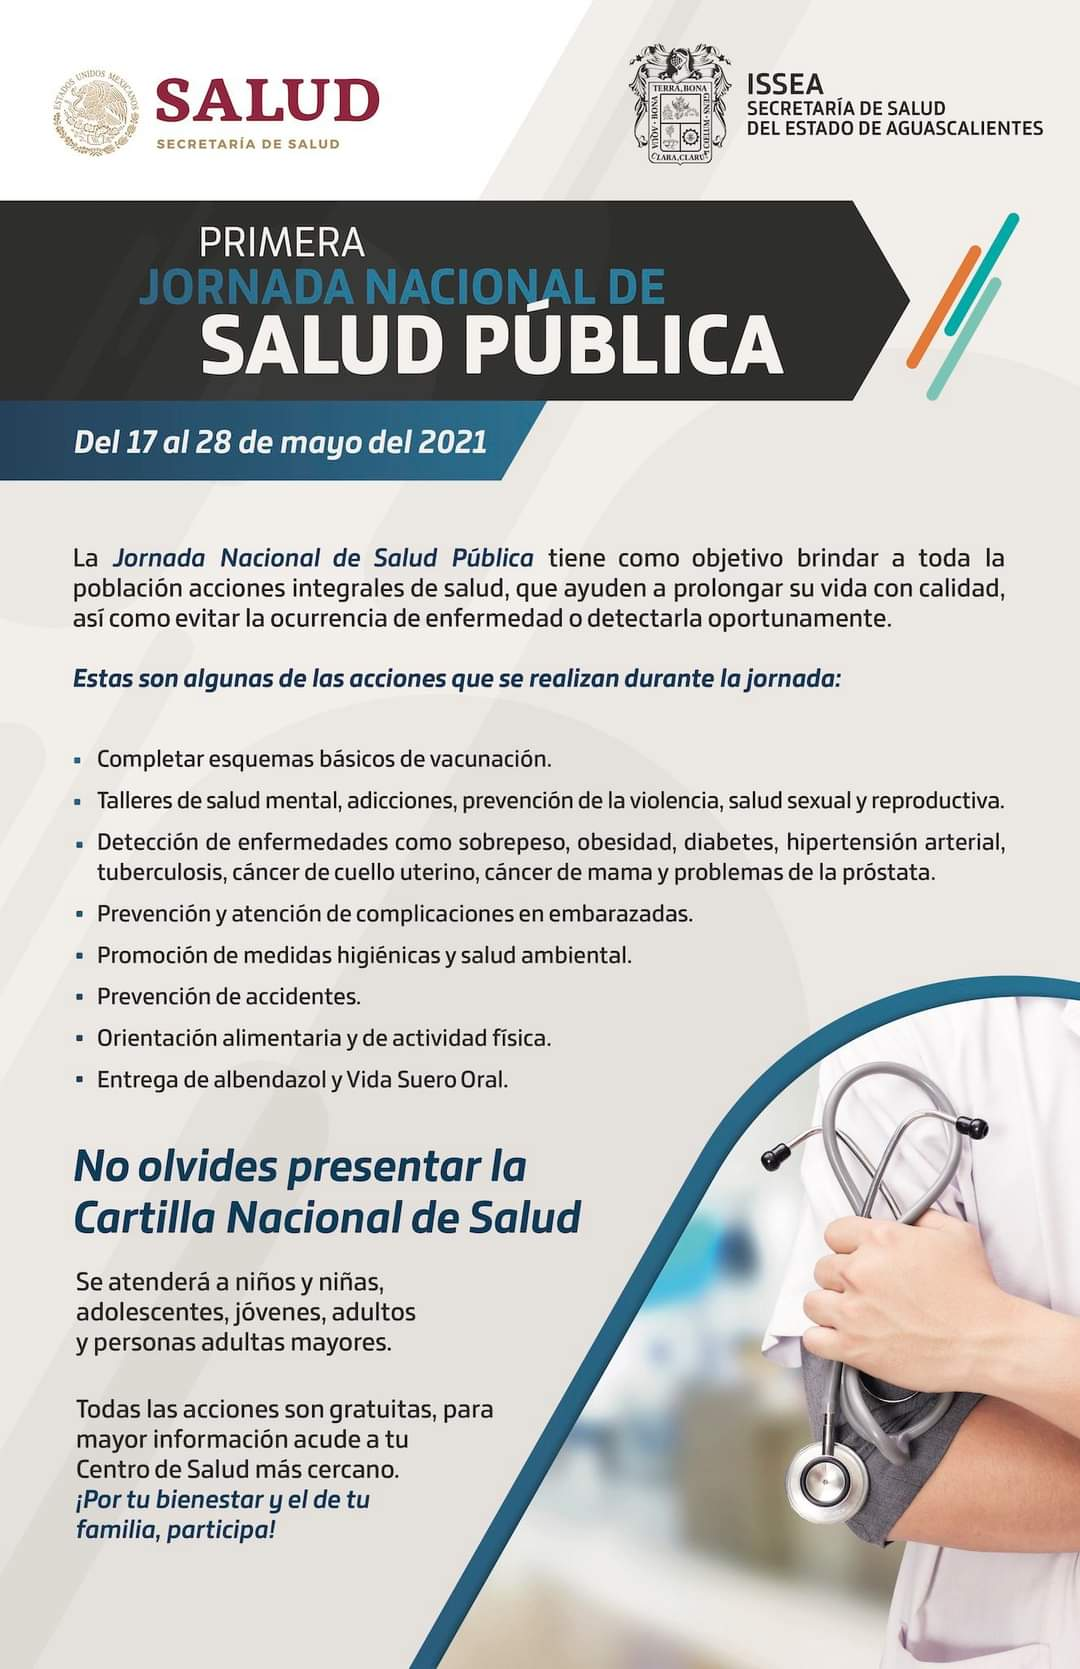 🩺💊Primera Jornada Nacional de Salud Pública. Del 17 al 28 de mayo